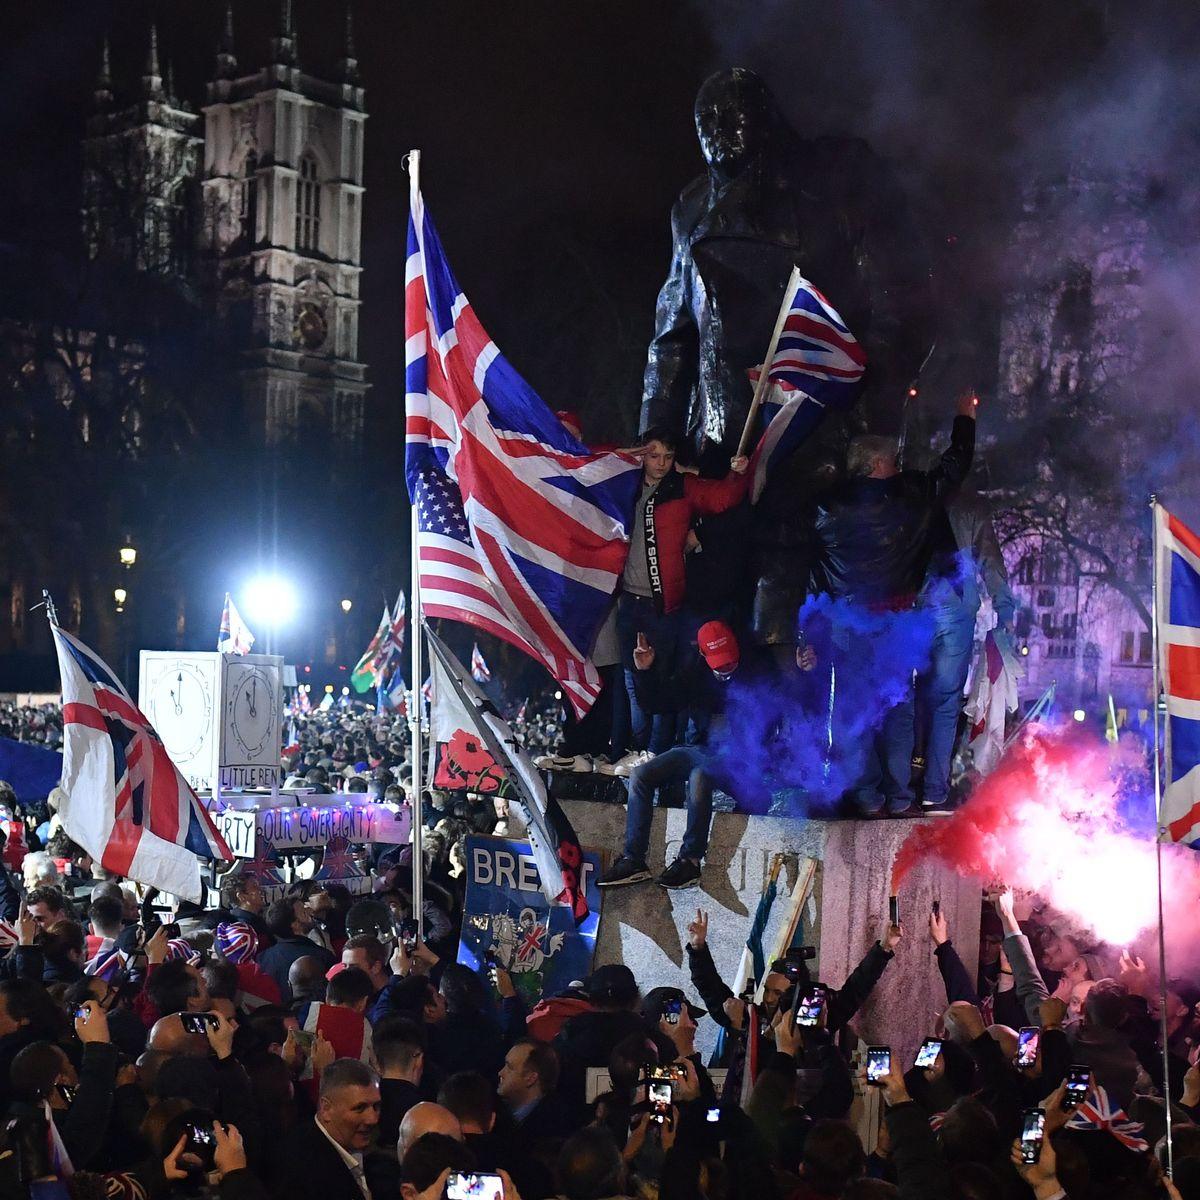 Videoreportage aus London: Brexit-Party mit Prosecco und Bengalos